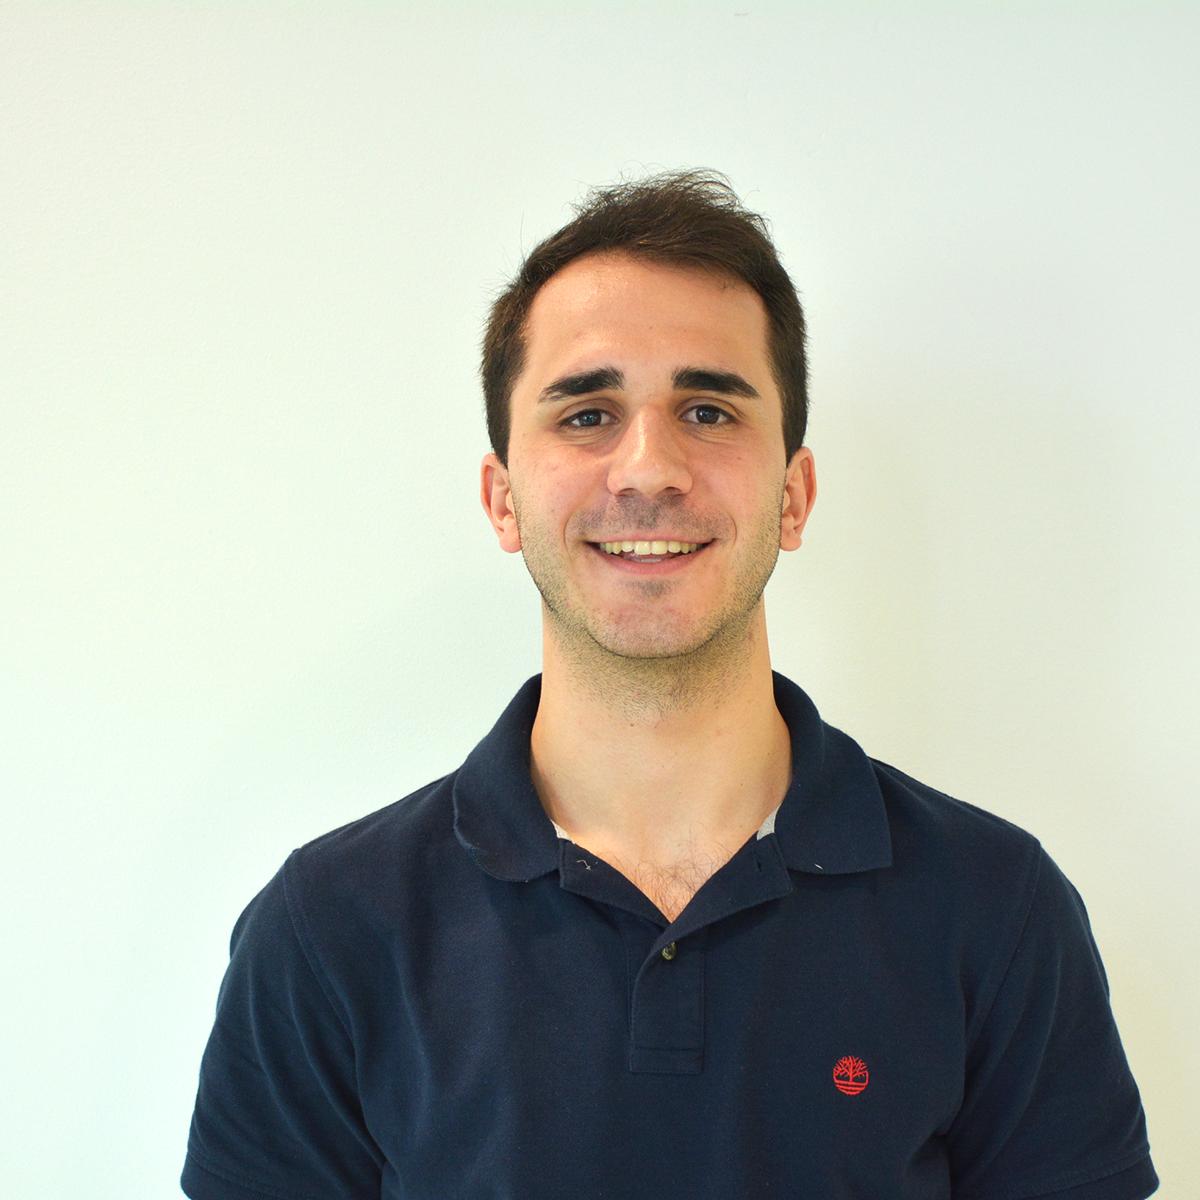 Antonio Chozas, Graduate Industrial Design